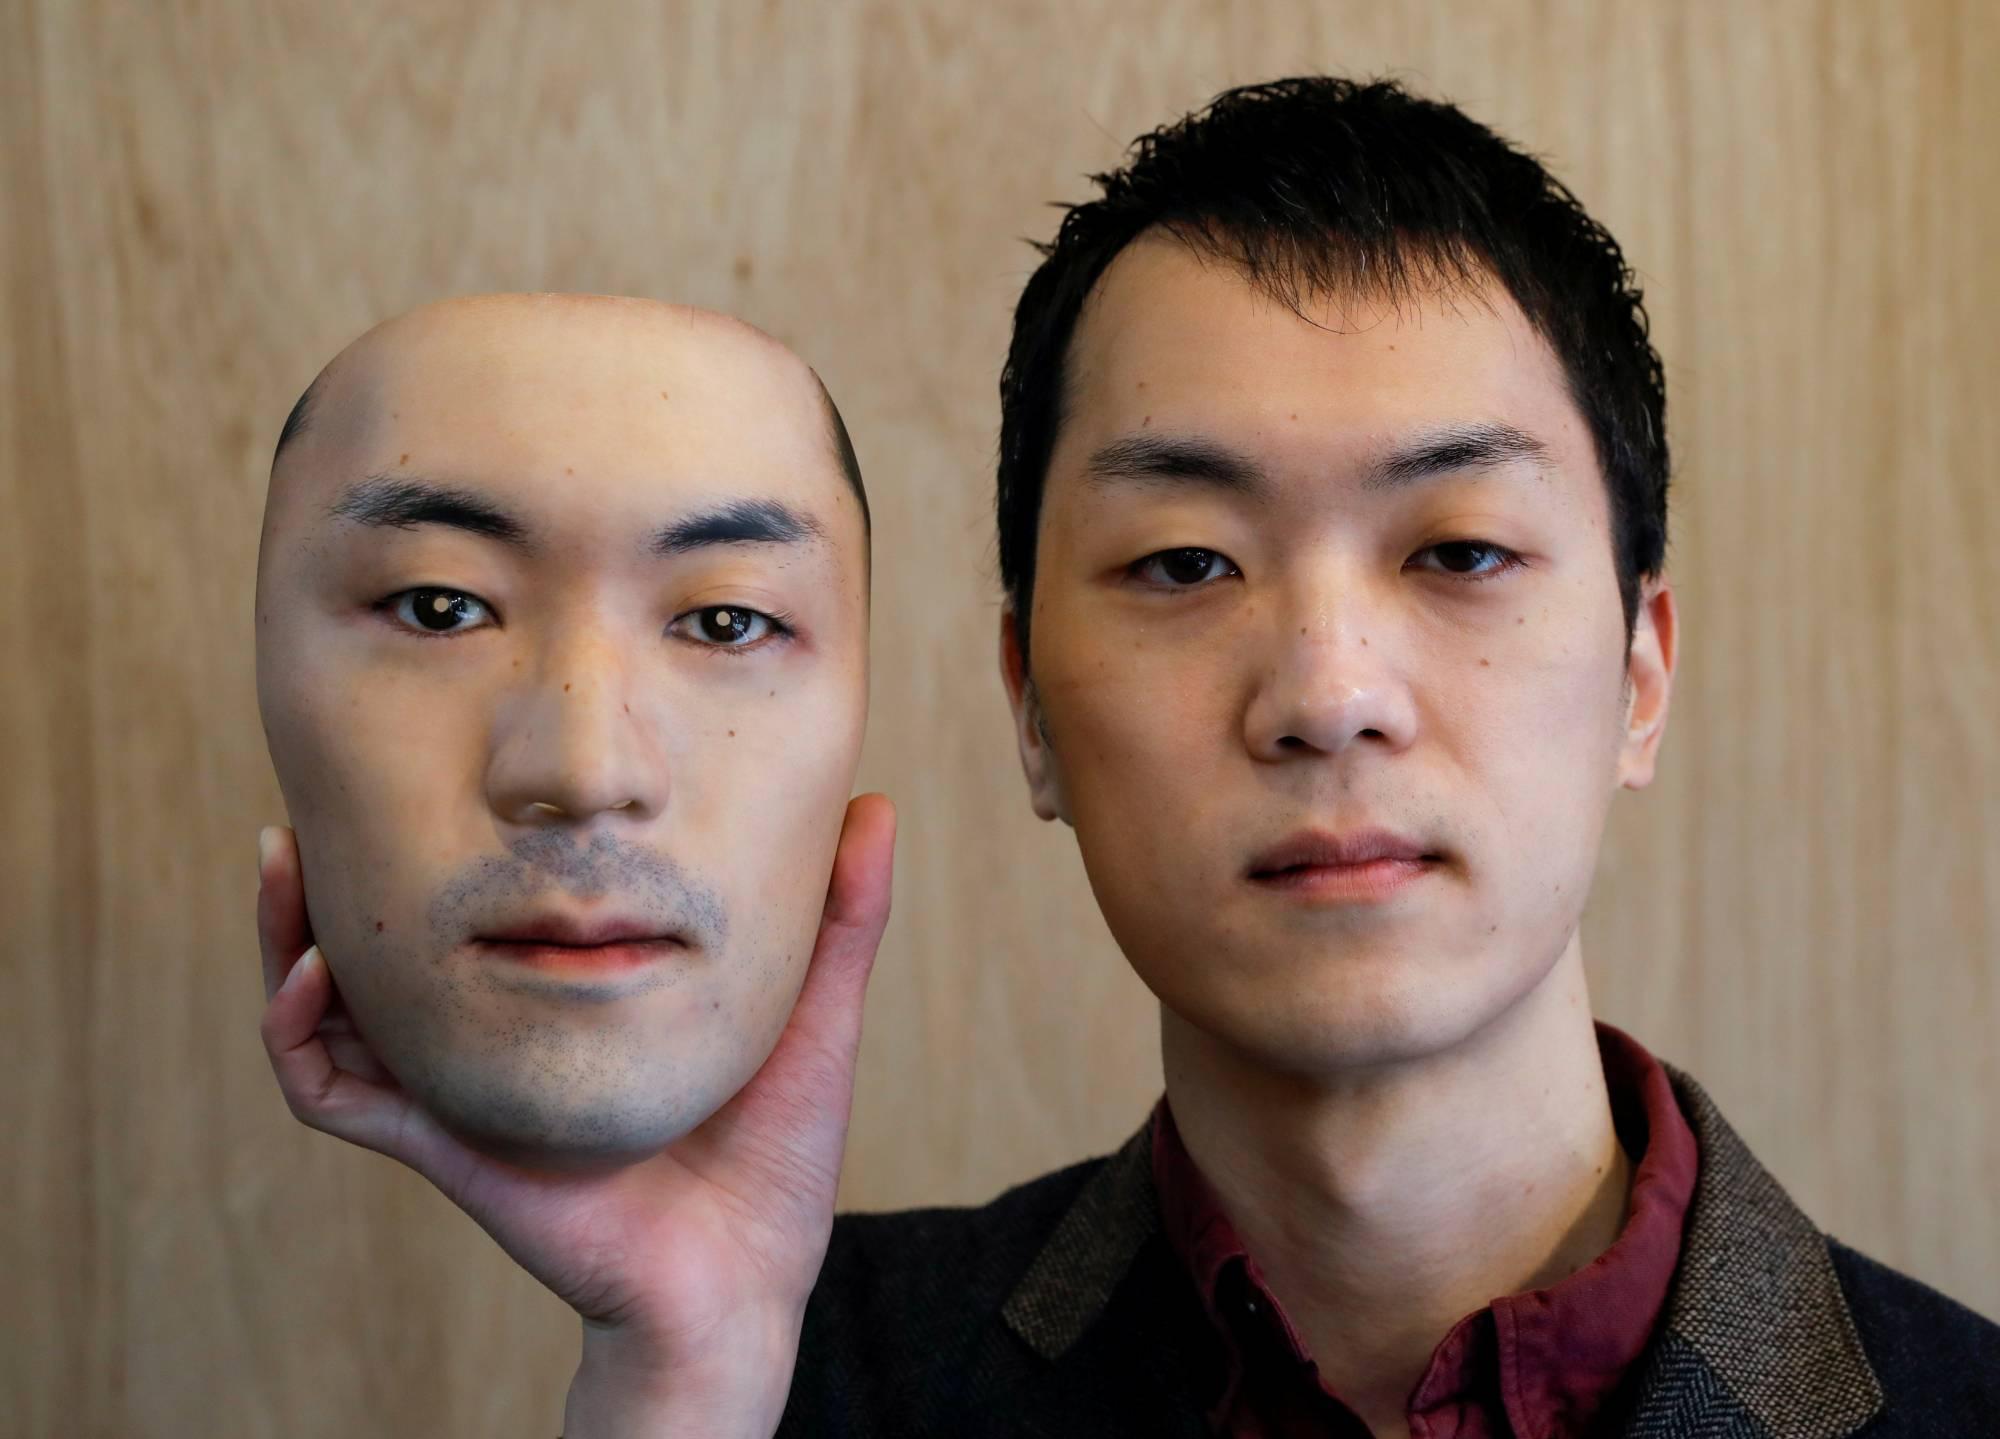 Shuhei Okawara, 30, holding a mask of his own face. Photo via Shuhei Okawara.